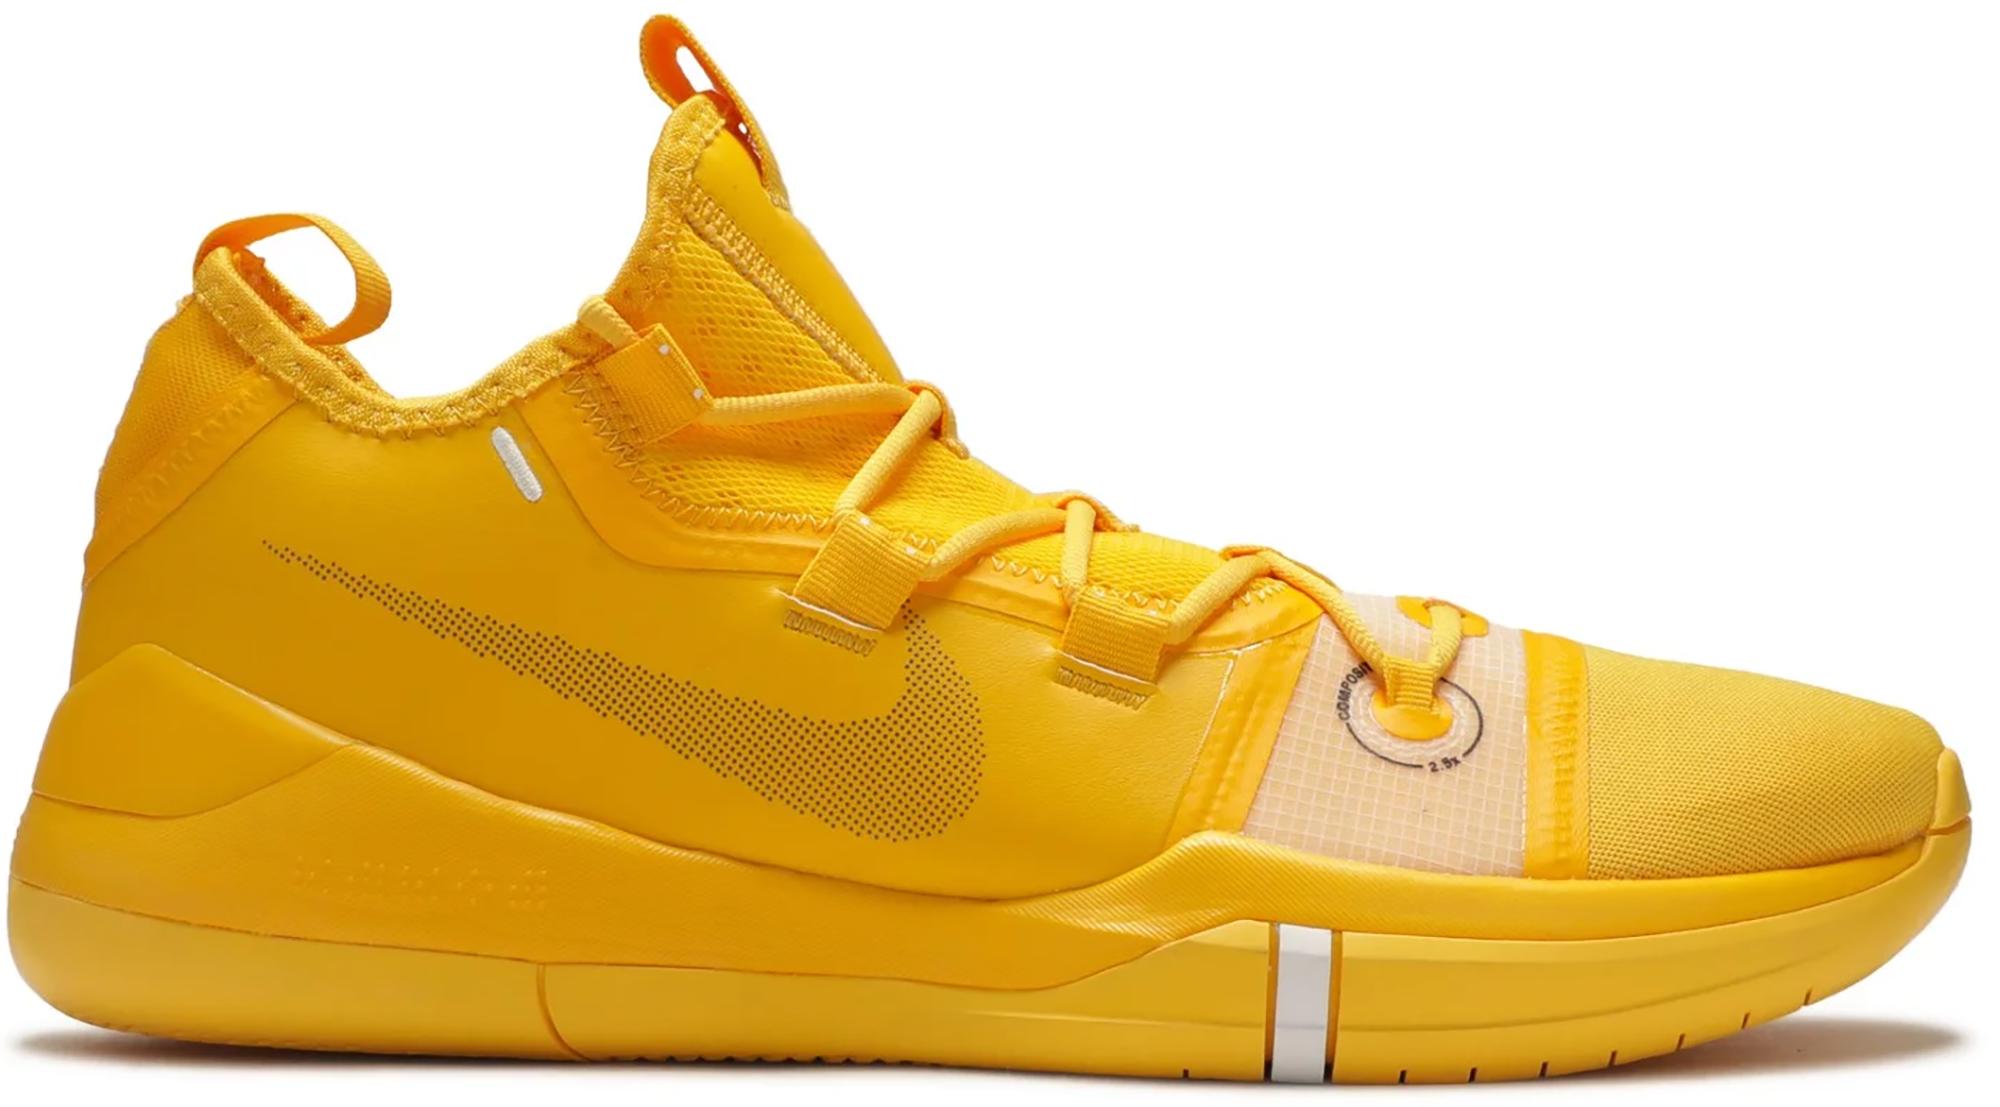 Nike Kobe A.D. Exodus Yellow - AT3874-701